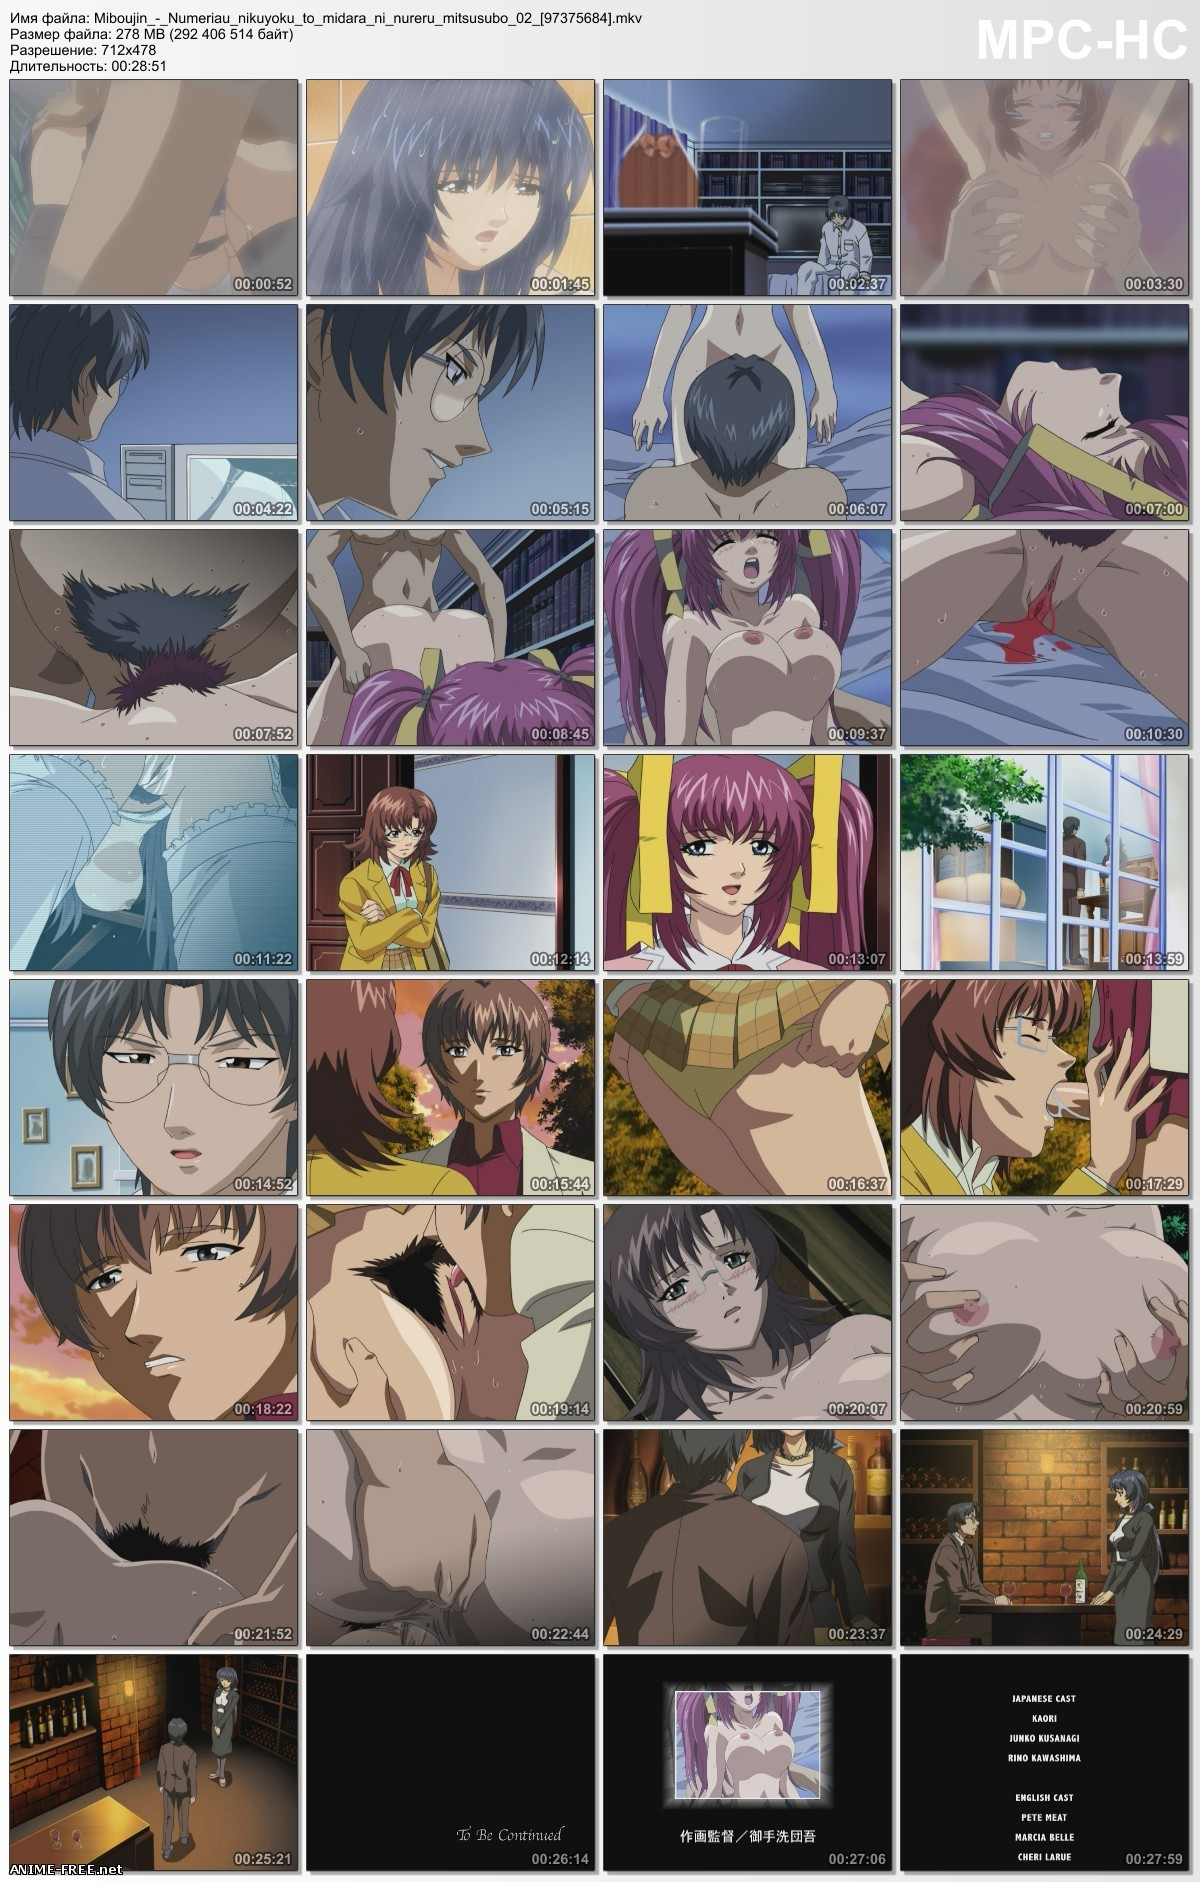 Miboujin: Numeriau Nikuyoku to Midara ni Nureru Mitsusubo / Widow / Вдова [2 из 2] [JAP,ENG,RUS] Anime Hentai